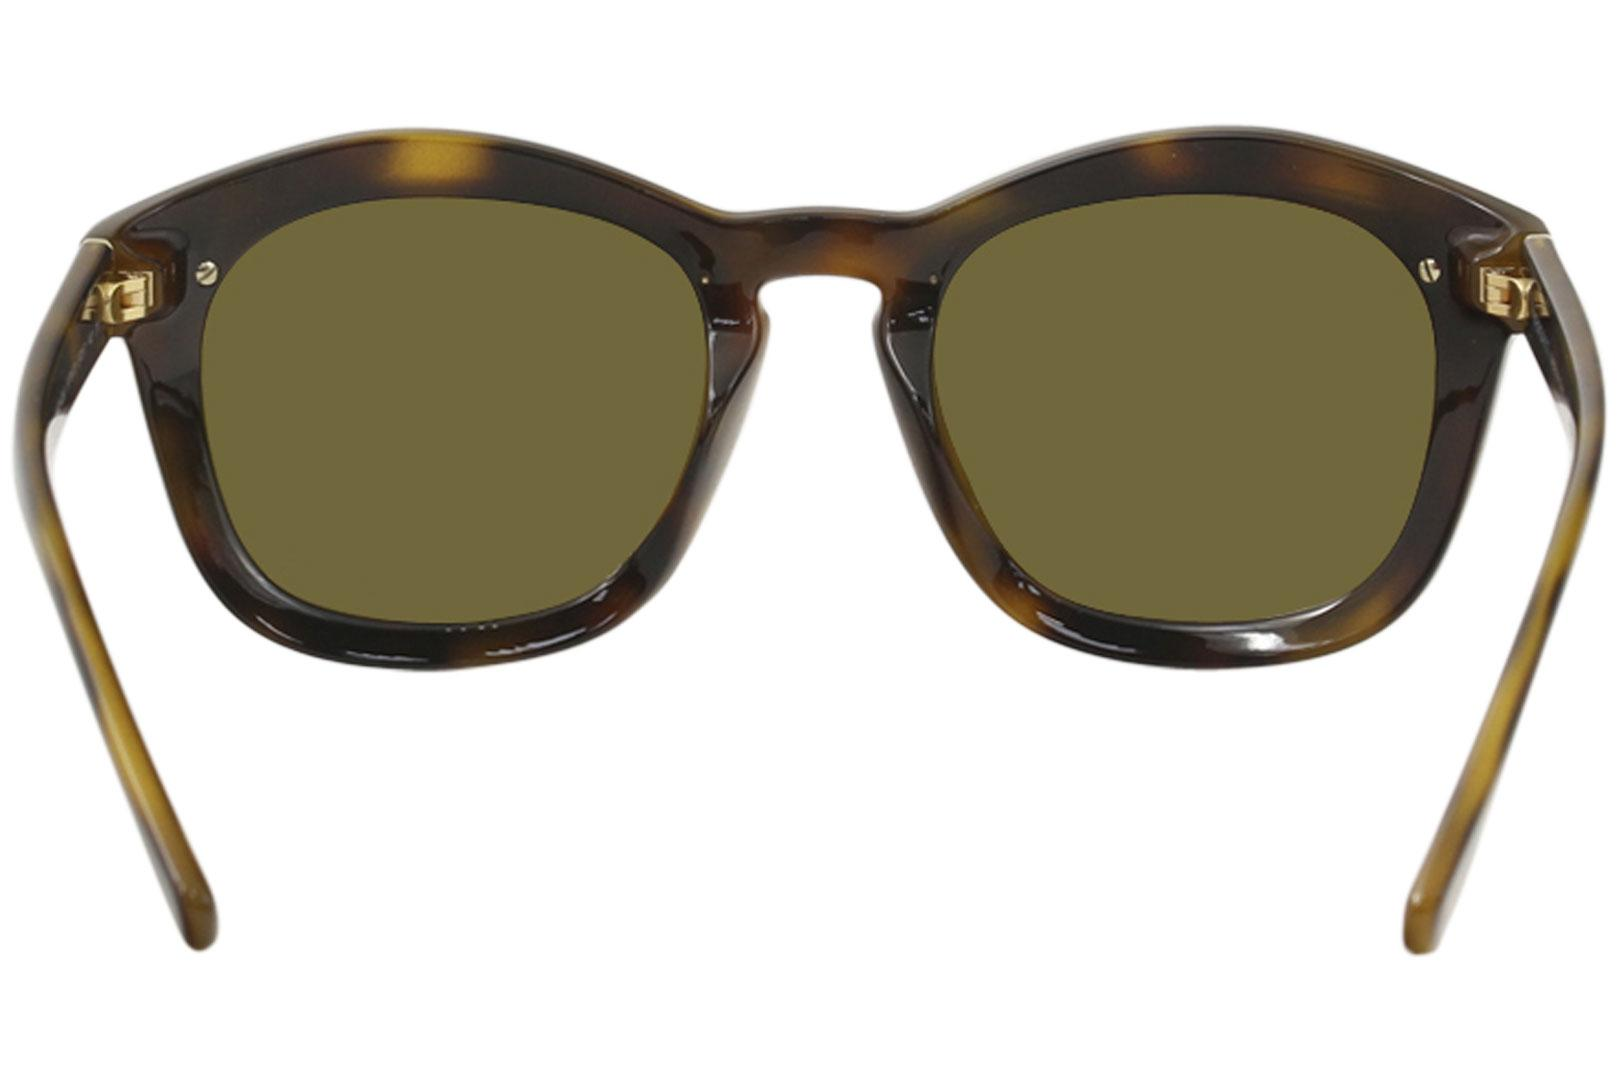 b35712793d Versace Women s VE4350 VE 4350 Fashion Square Sunglasses